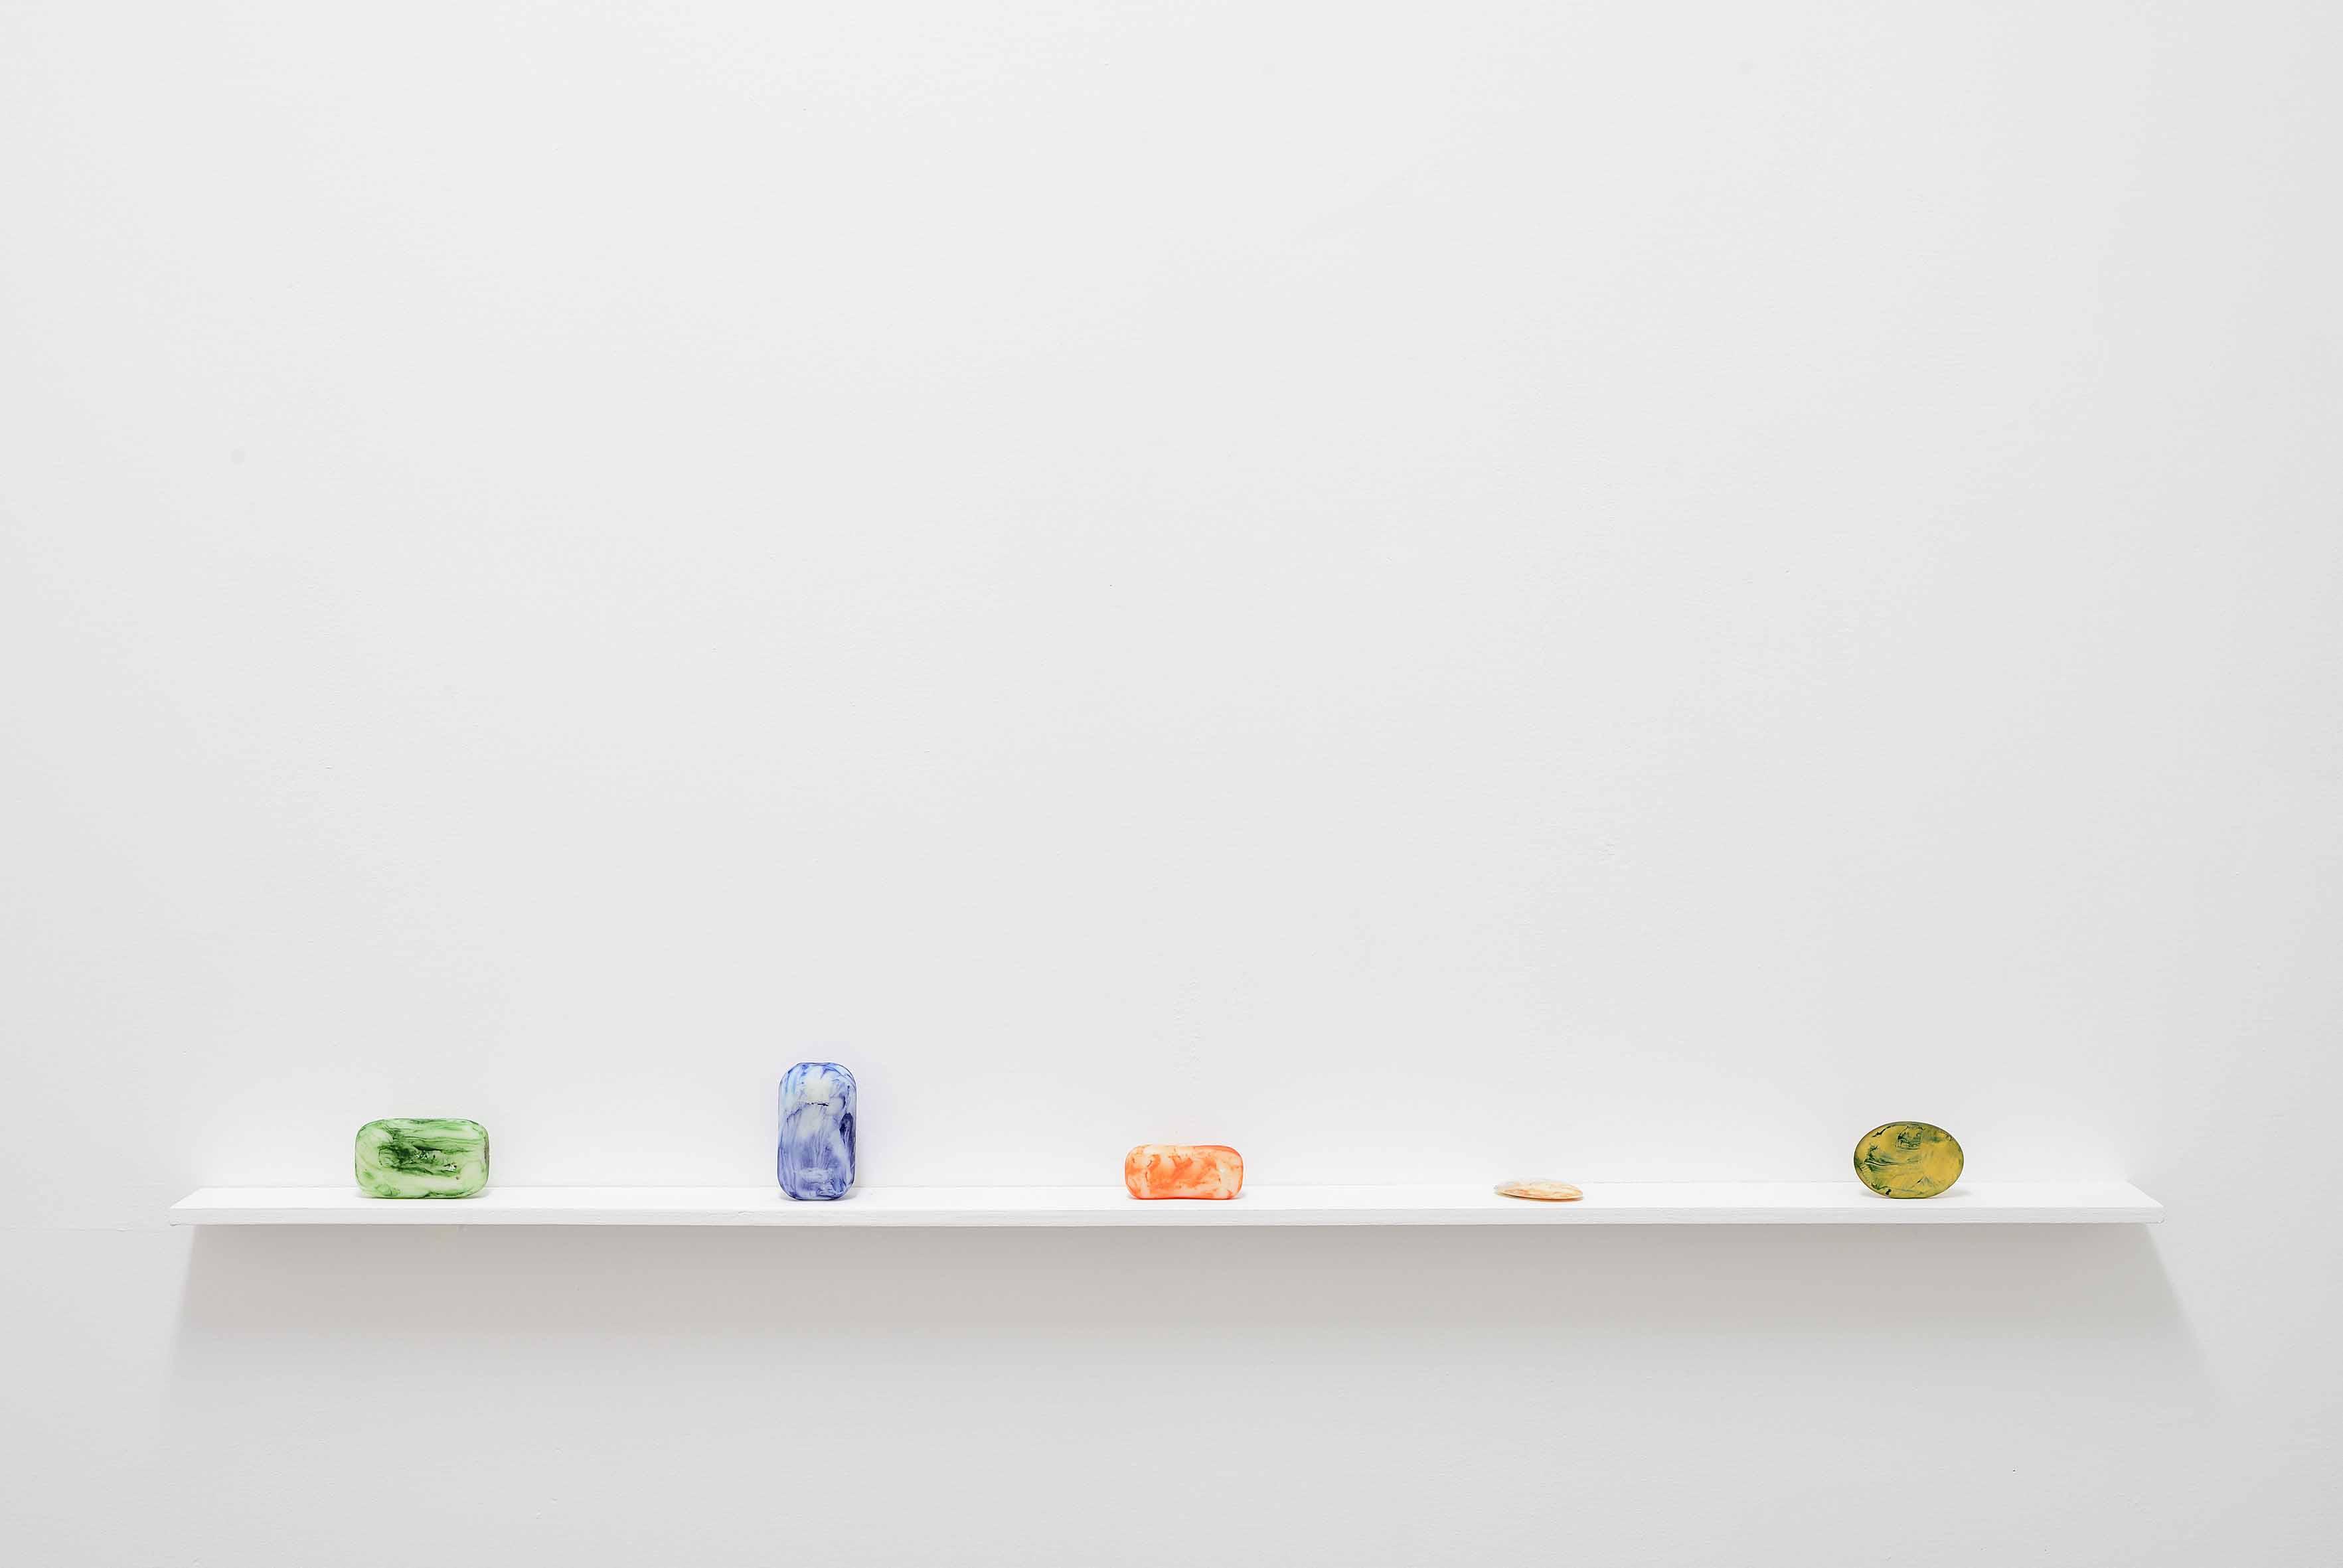 Kate Owens, Towards Zero (19-23)[2013], savon et peinture, dimensions variables. Courtesy of the artist and Limoncello, London, UnitedKingdom.